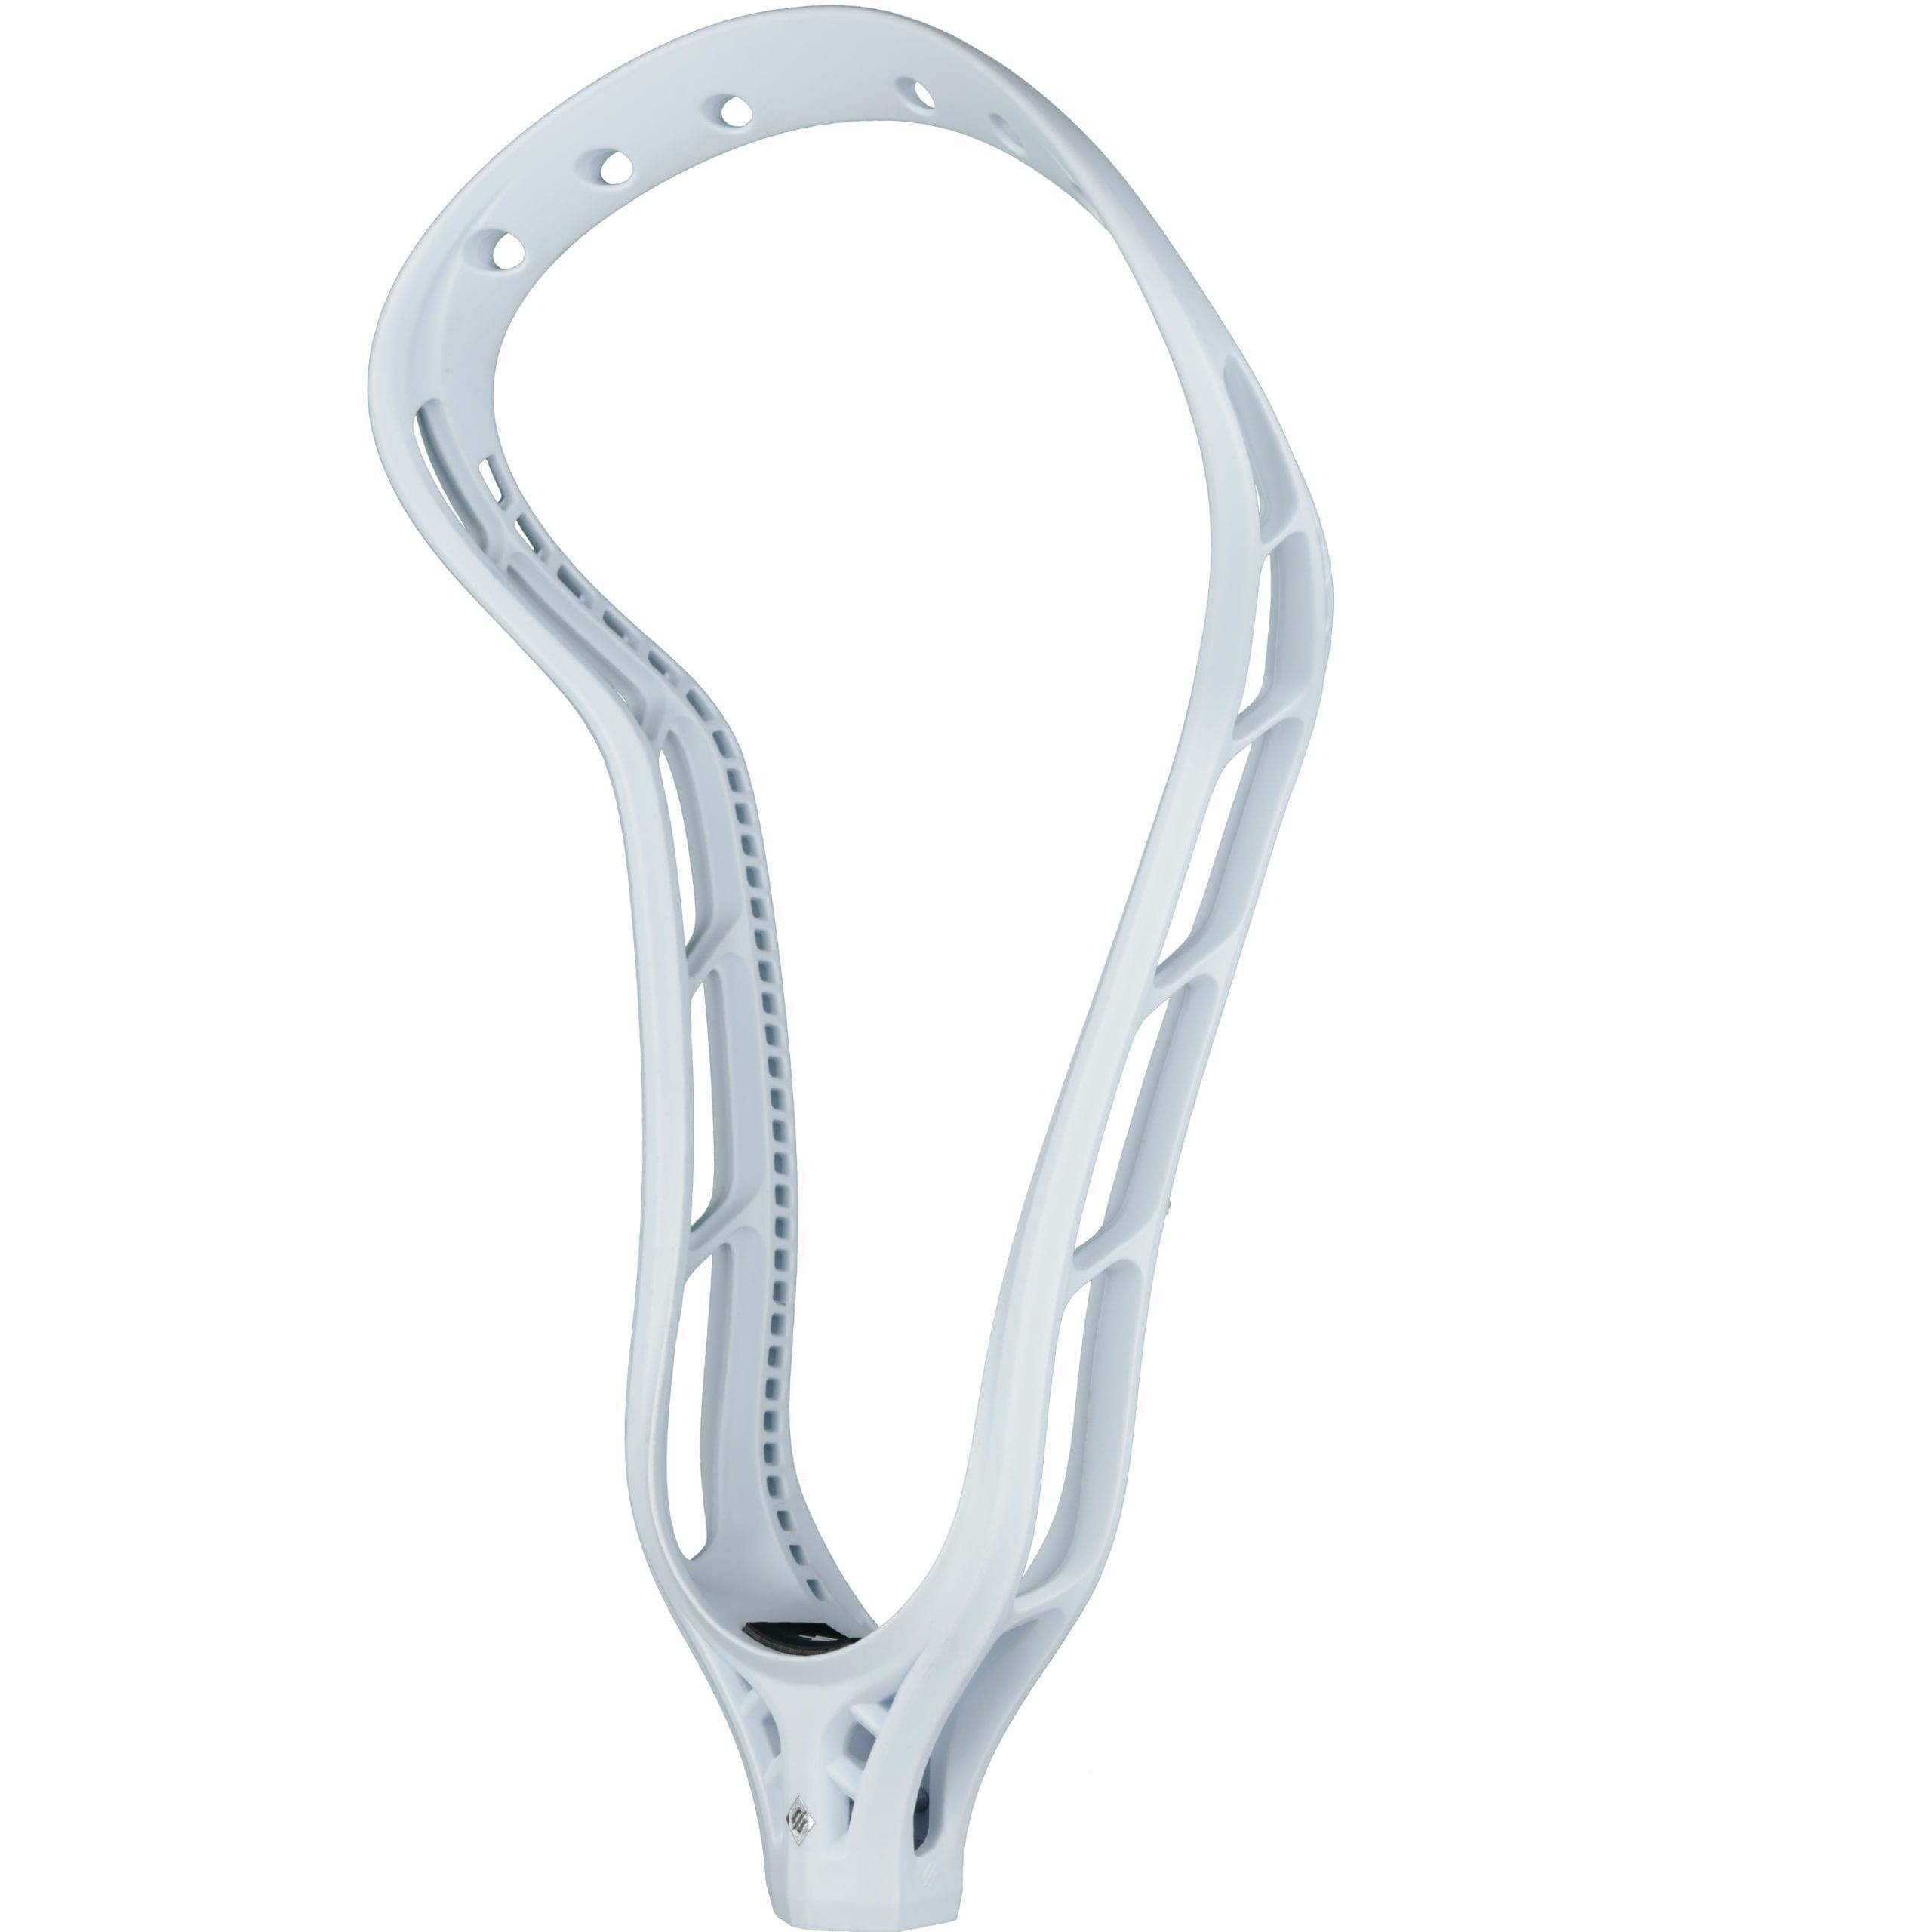 StringKing-Womens-Mark-2-Offense-FrontISO-Unstrung-White4000-scaled-1.jpg